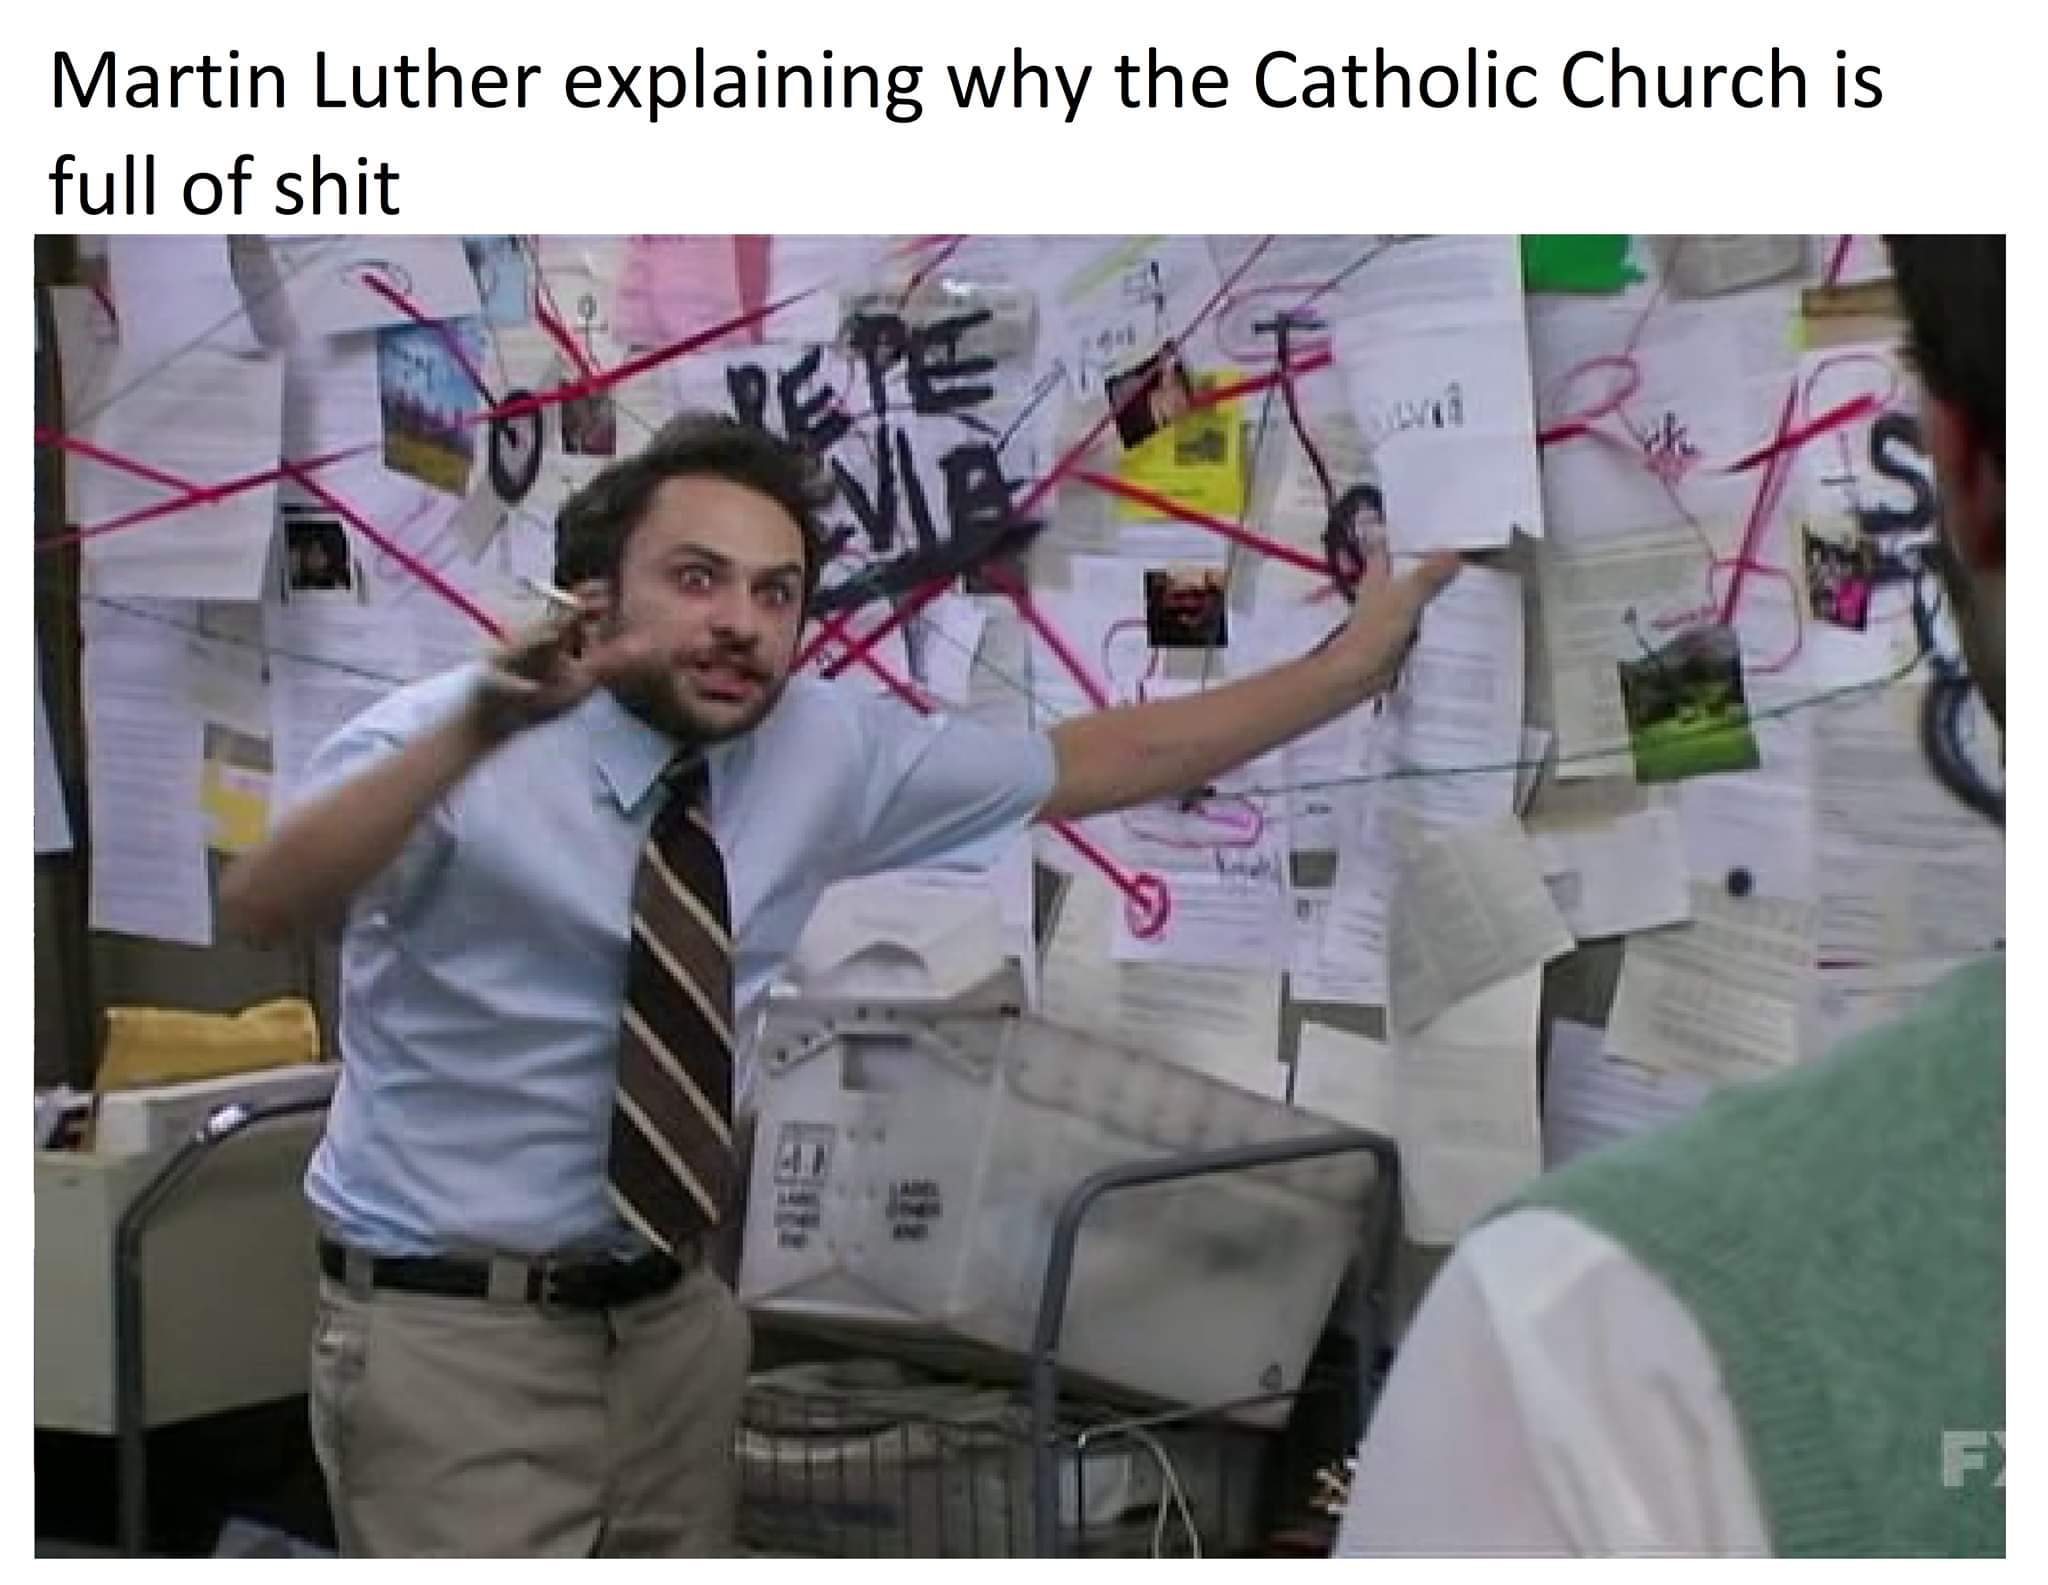 catholics or neckbeards won't understand - meme